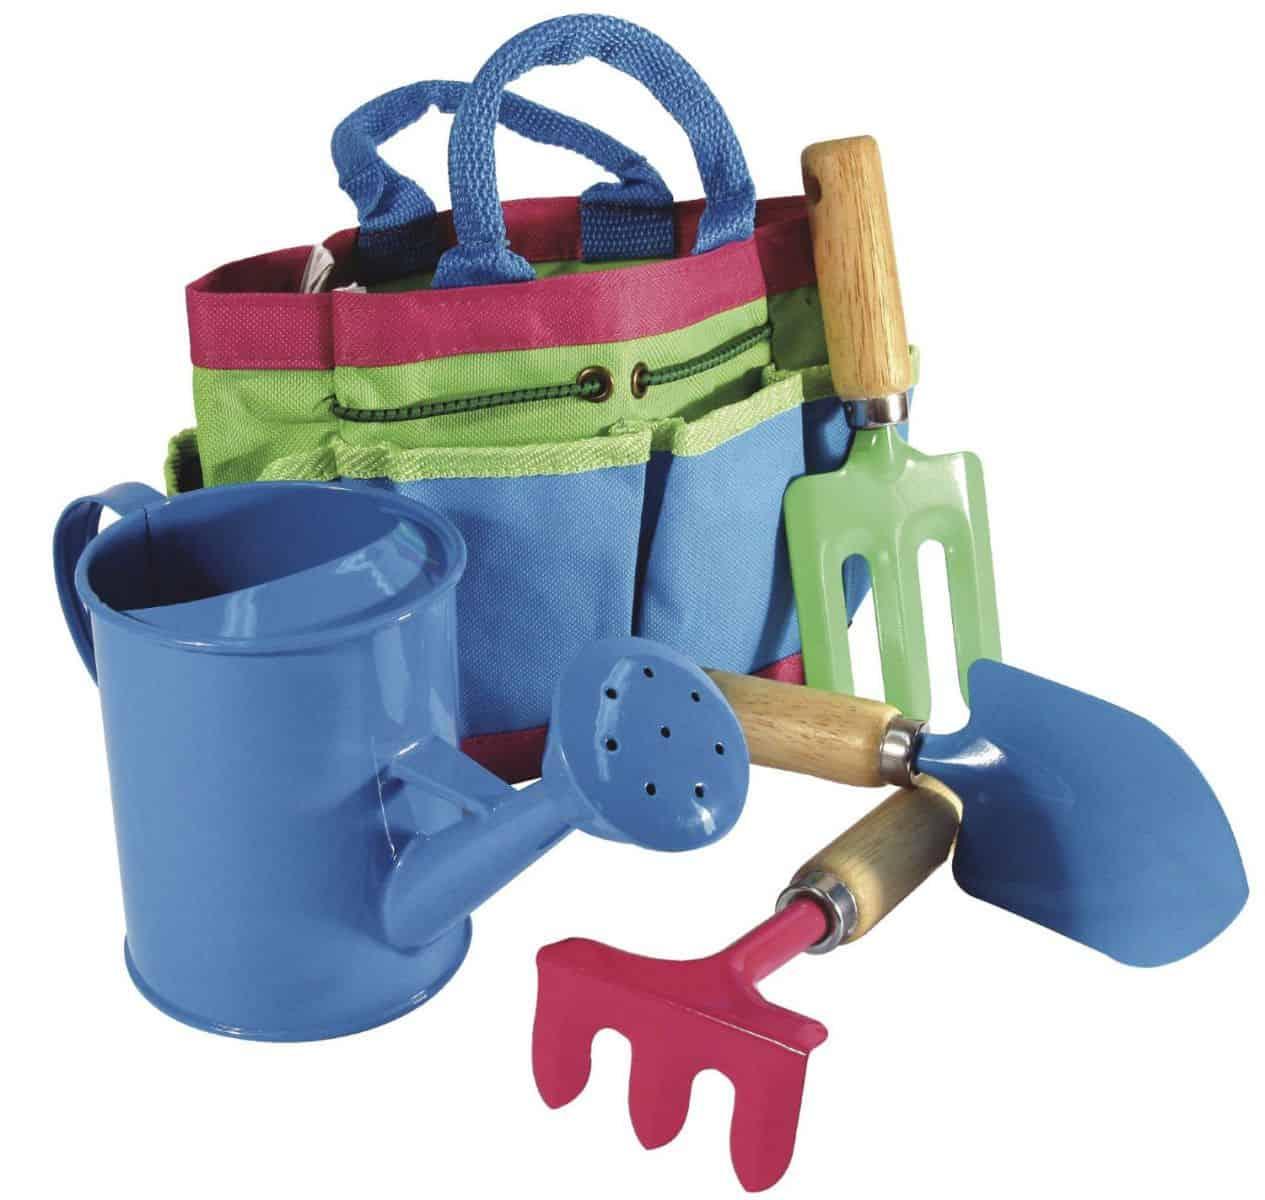 Hello wonderful 10 beginner gardening tools for kids for Gardening tools for kids